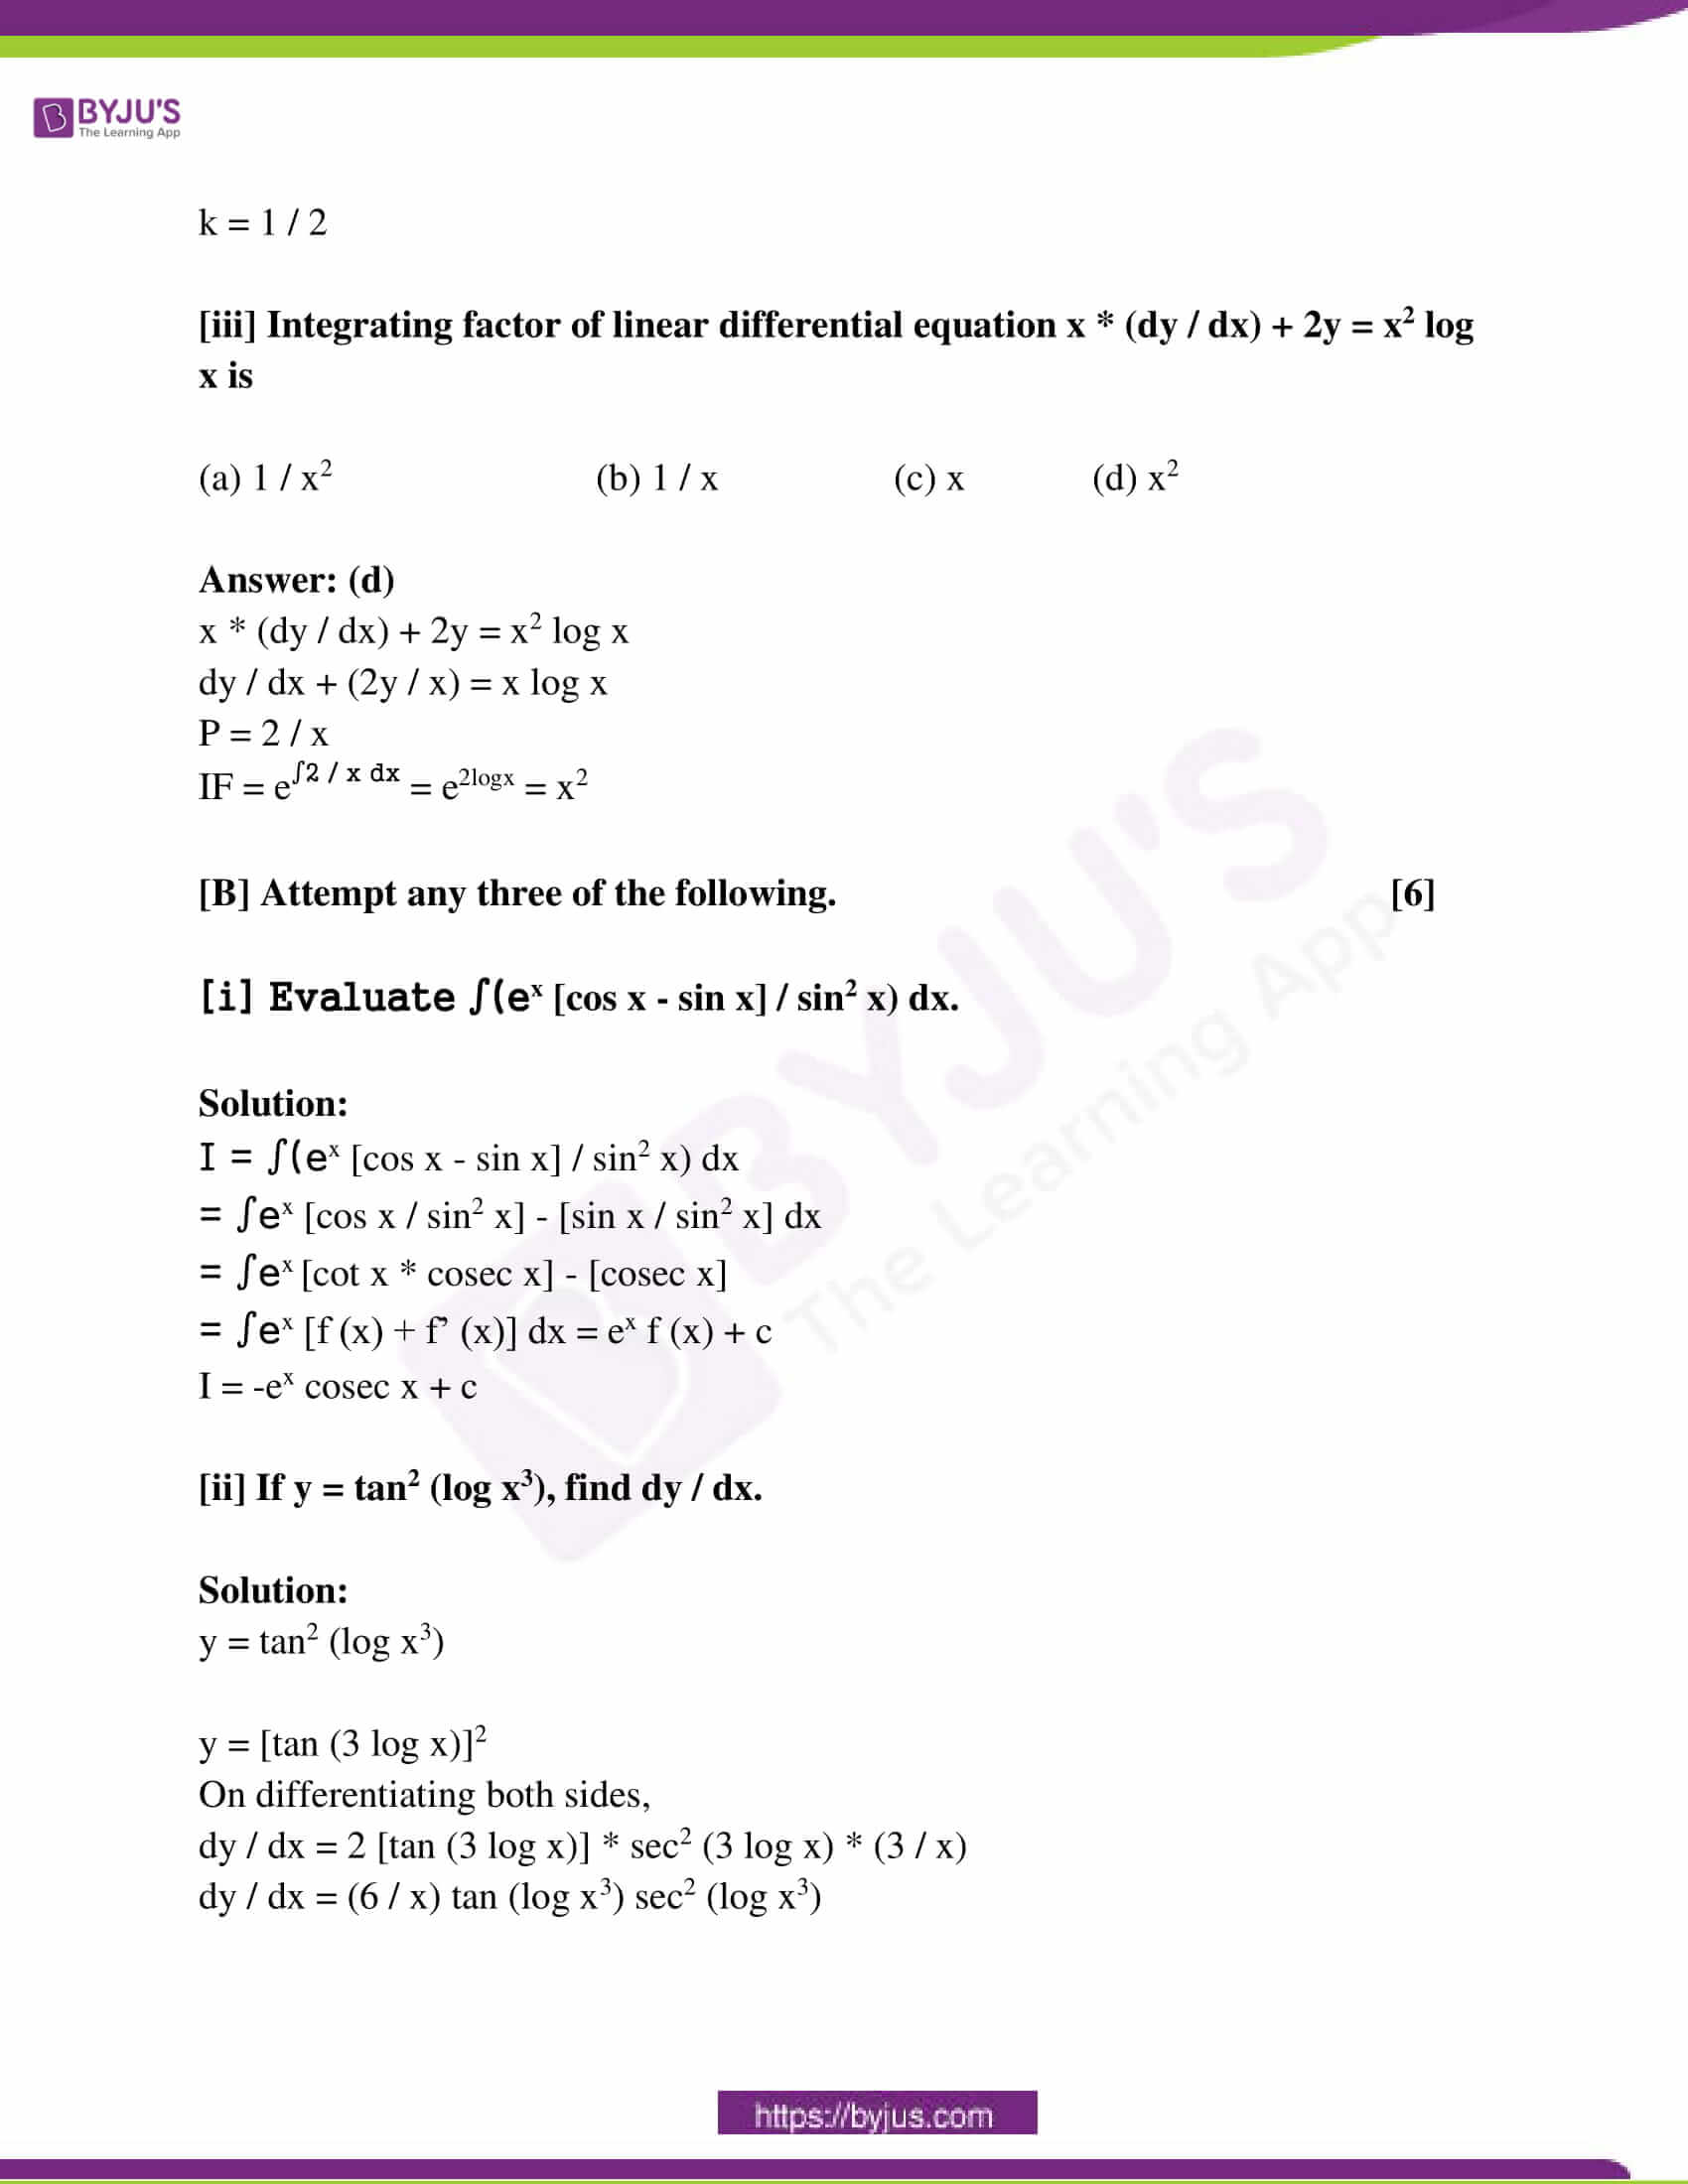 maharashtra class 12 exam question paper solutions march 2018 15